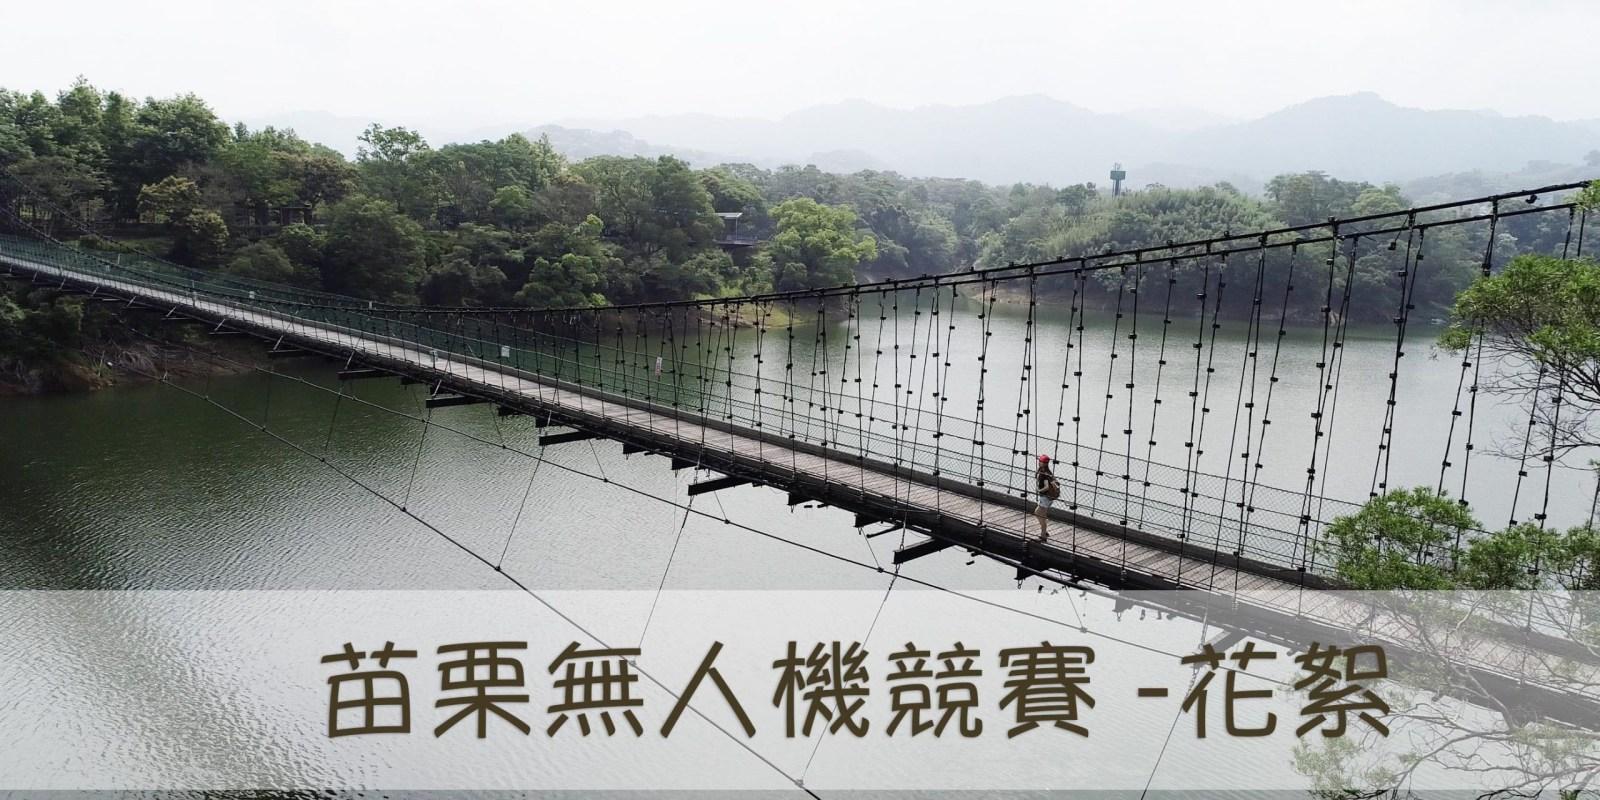 Vlog 紀錄》Taiwan Miaoli - 心旅行、新體驗「從空中看苗栗」無人機攝影競賽